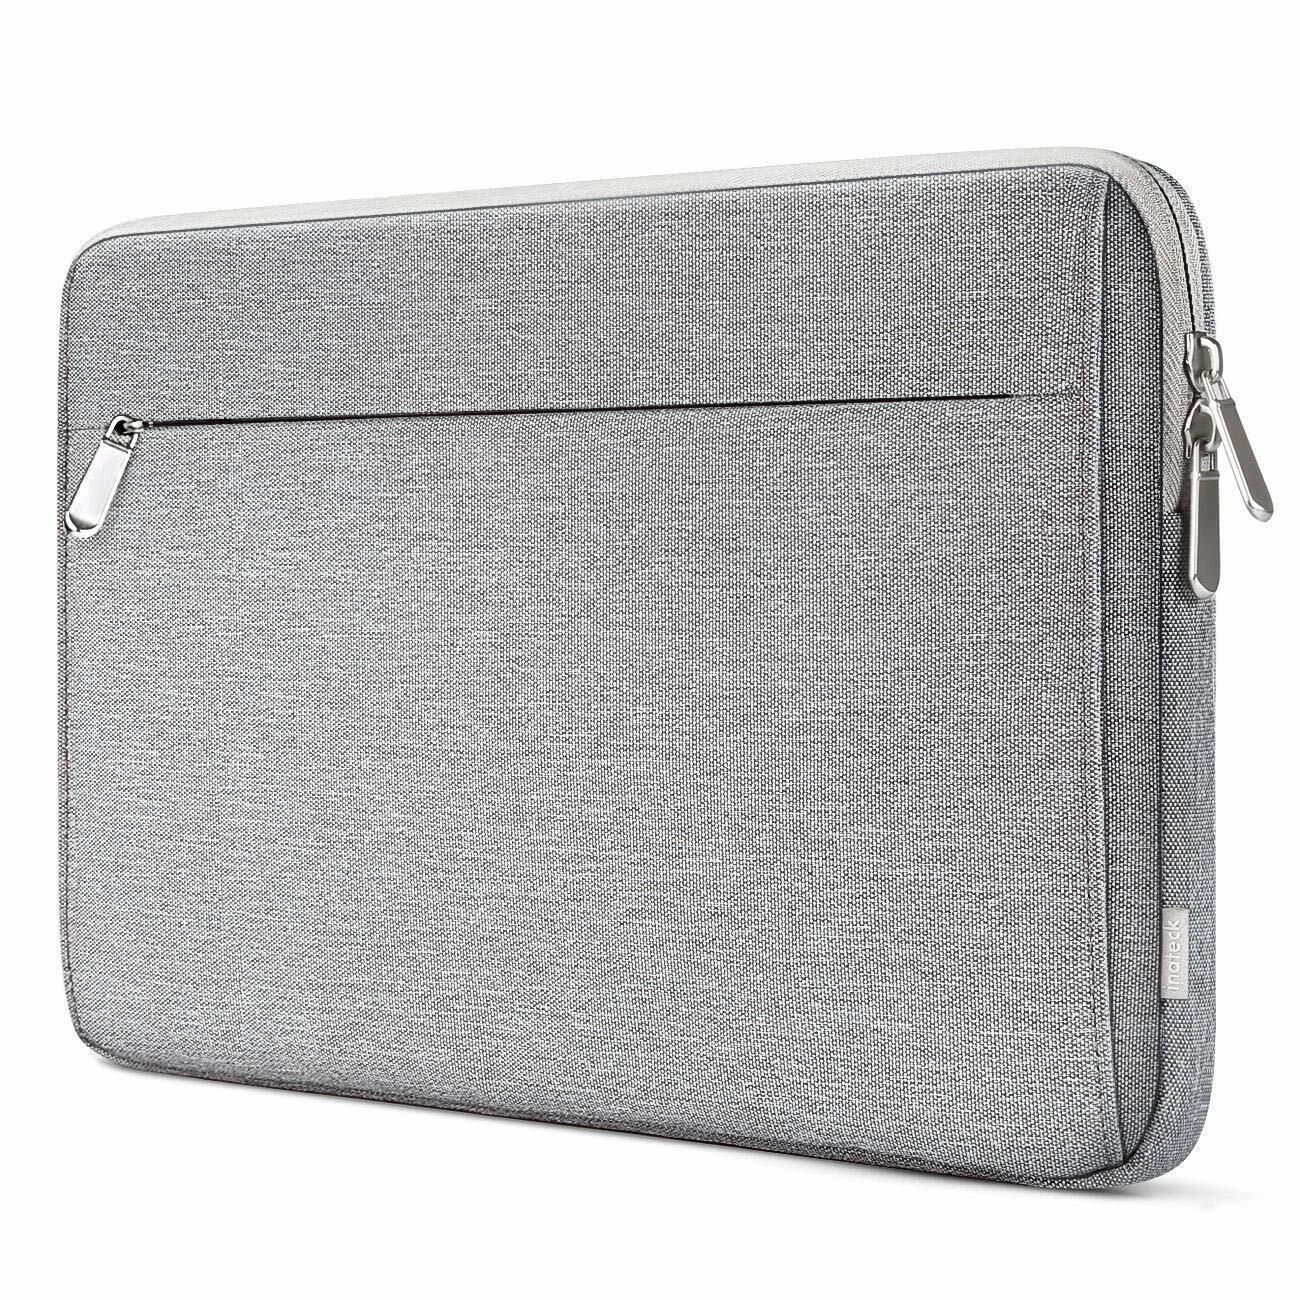 Inateck 12,3-13 Zoll Laptop-Hülle, stoßfeste Schutzhülle kompatibel mit MacBook